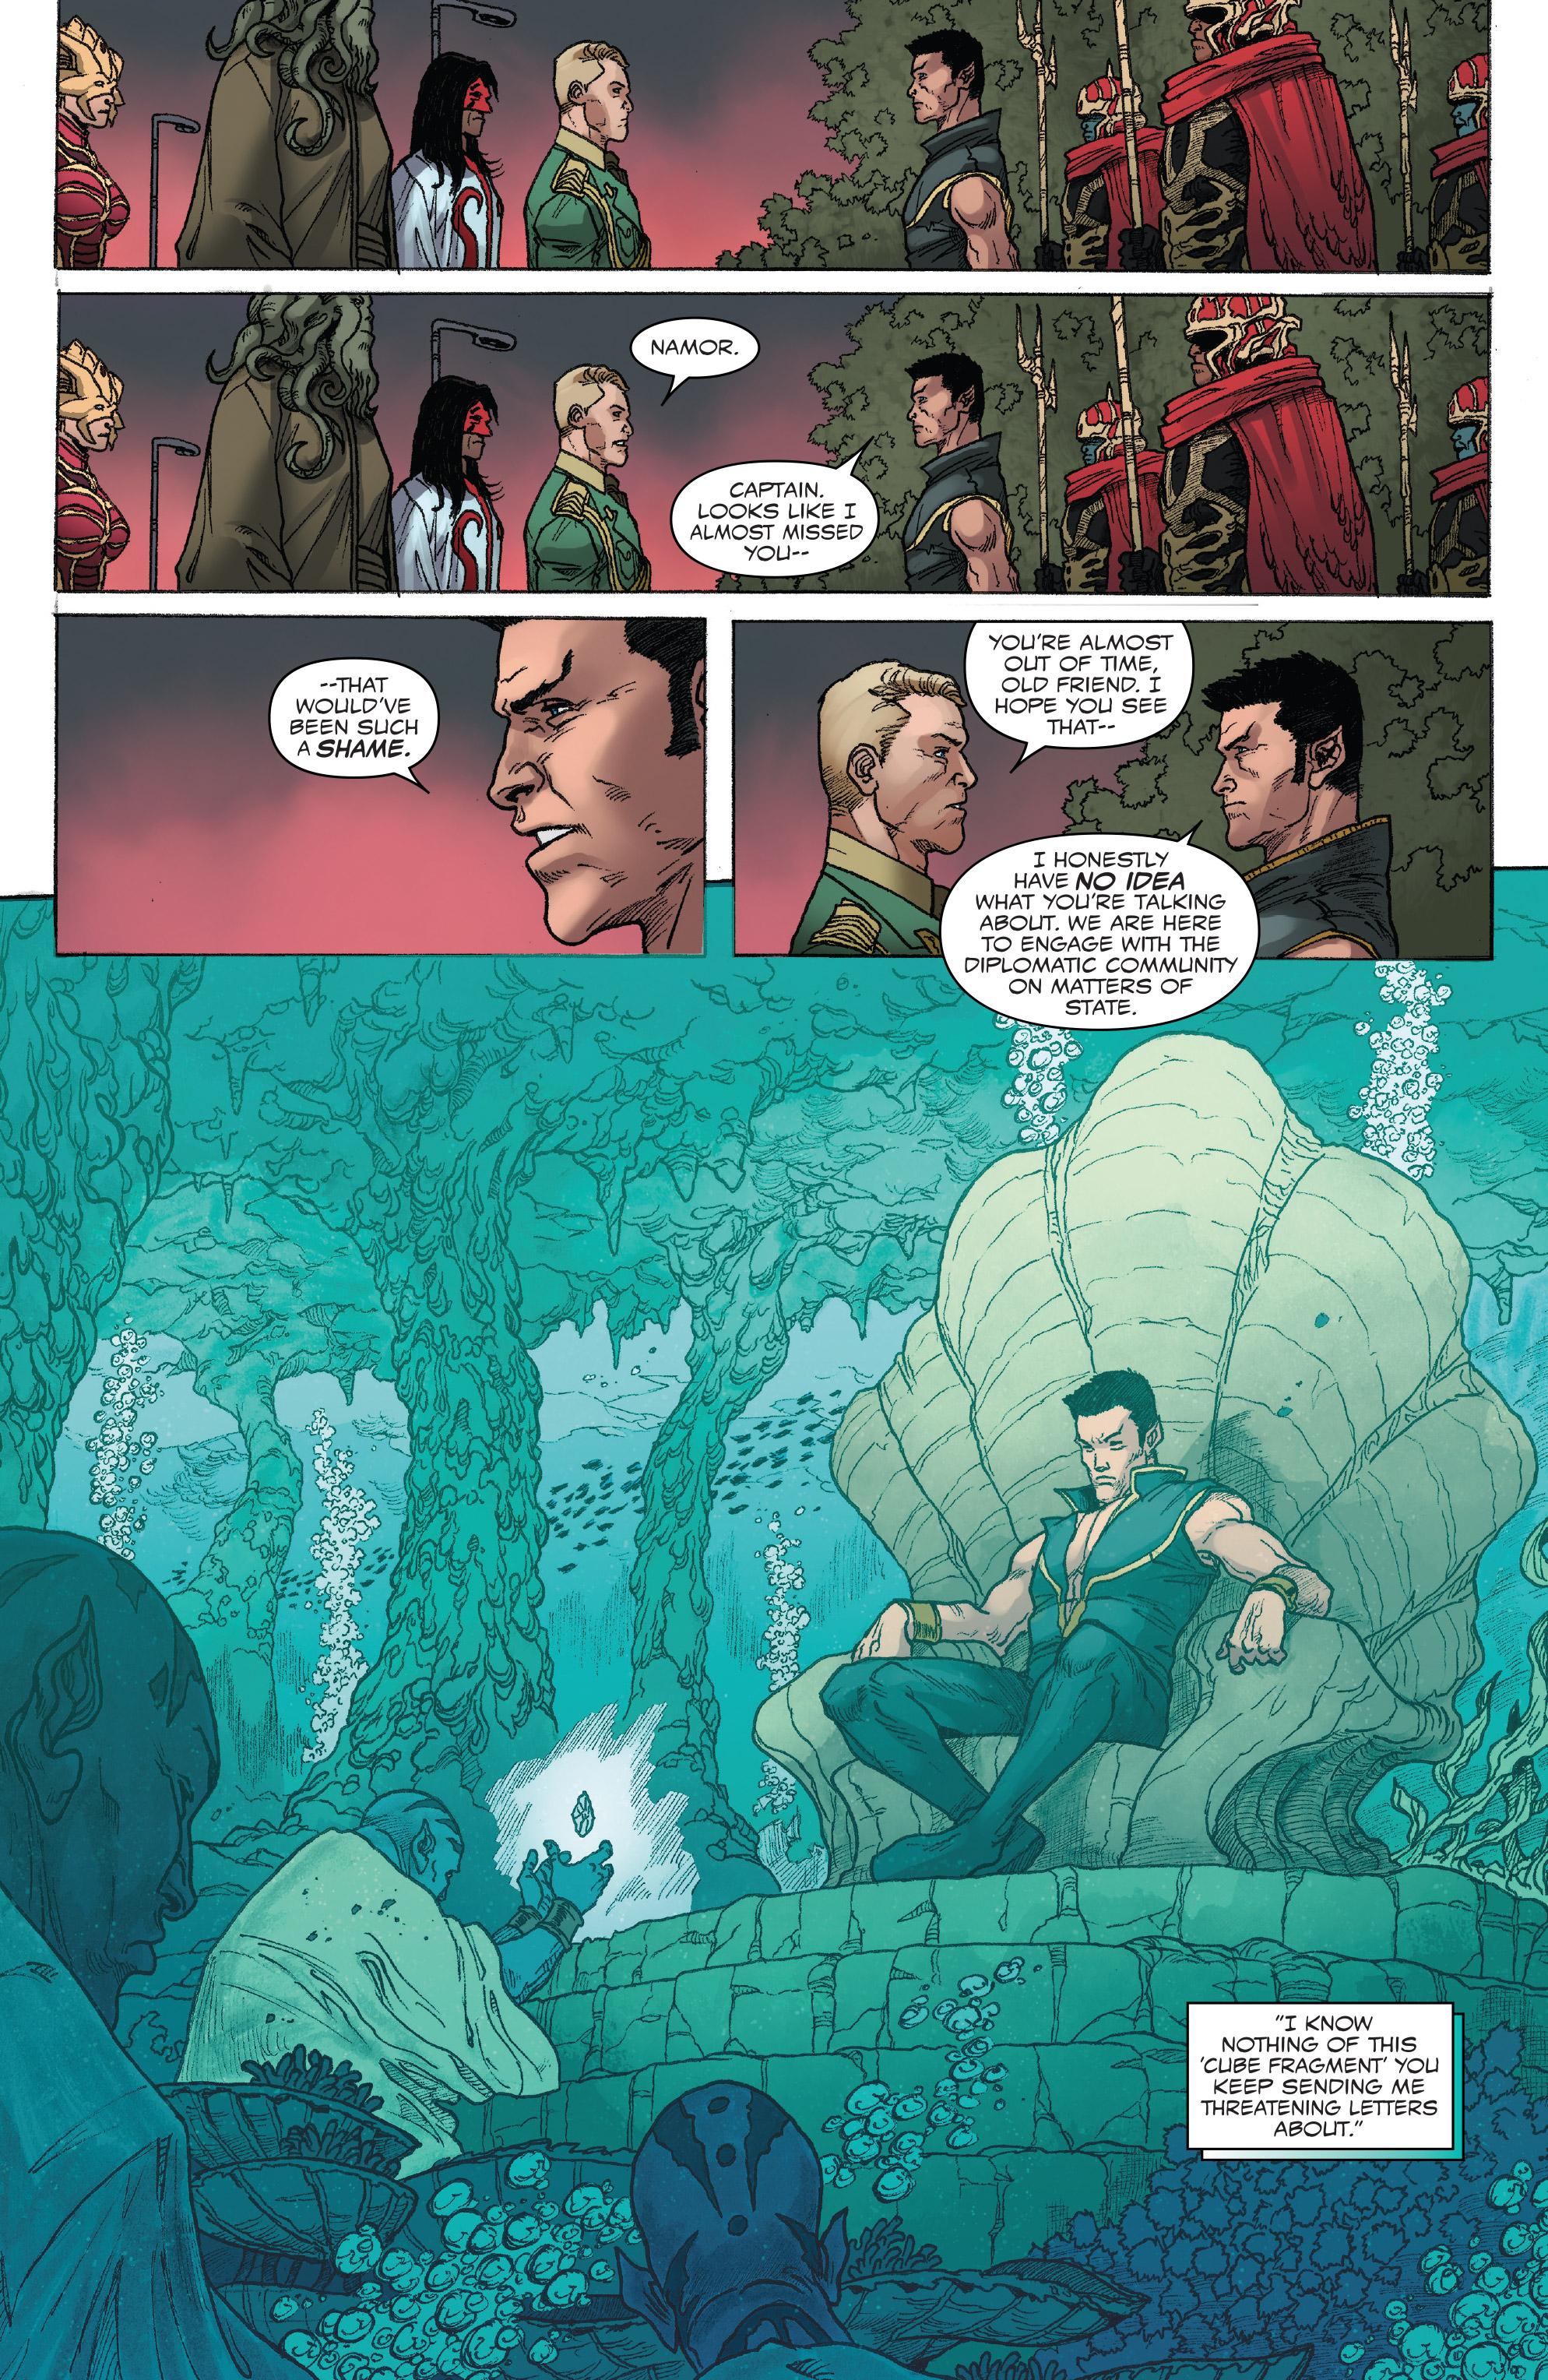 Read online Captain America: Steve Rogers comic -  Issue #18 - 20